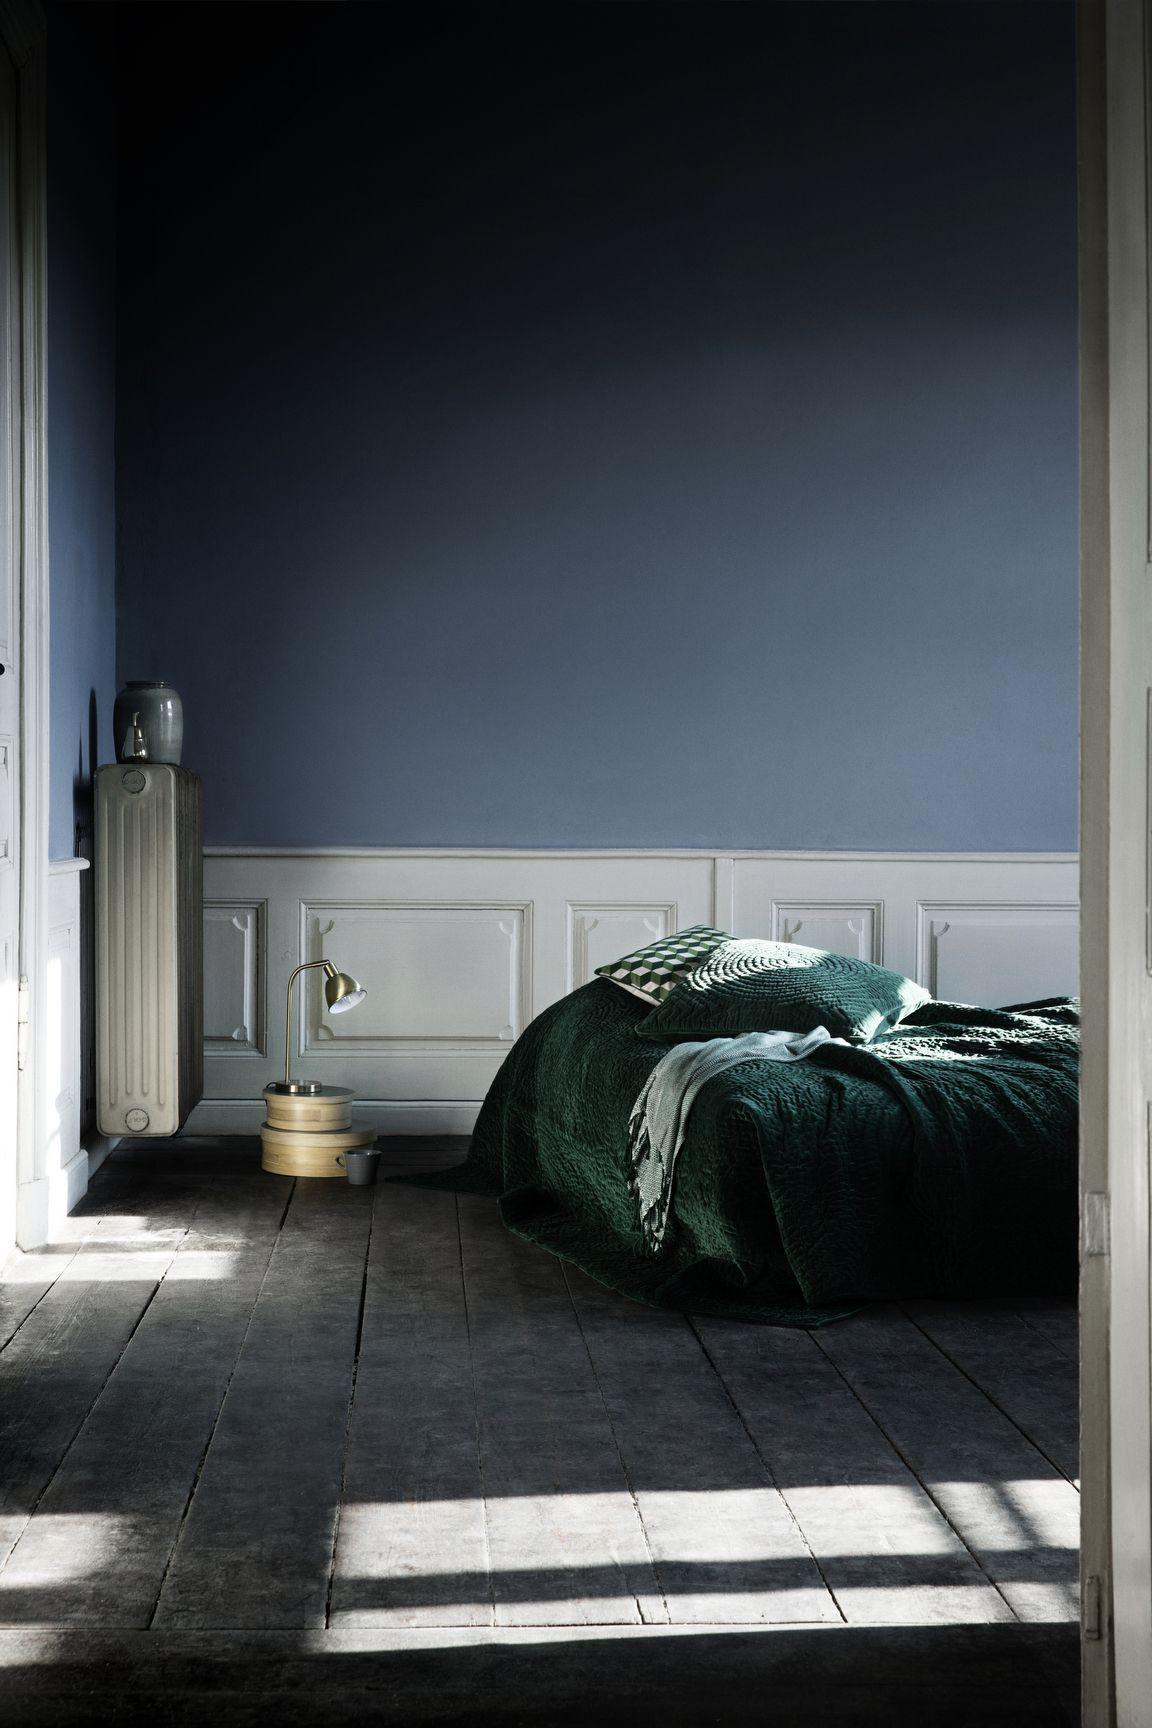 Blaue Wand hinterm Bett davor weiße Vertäfelung?? | X_CIG ...